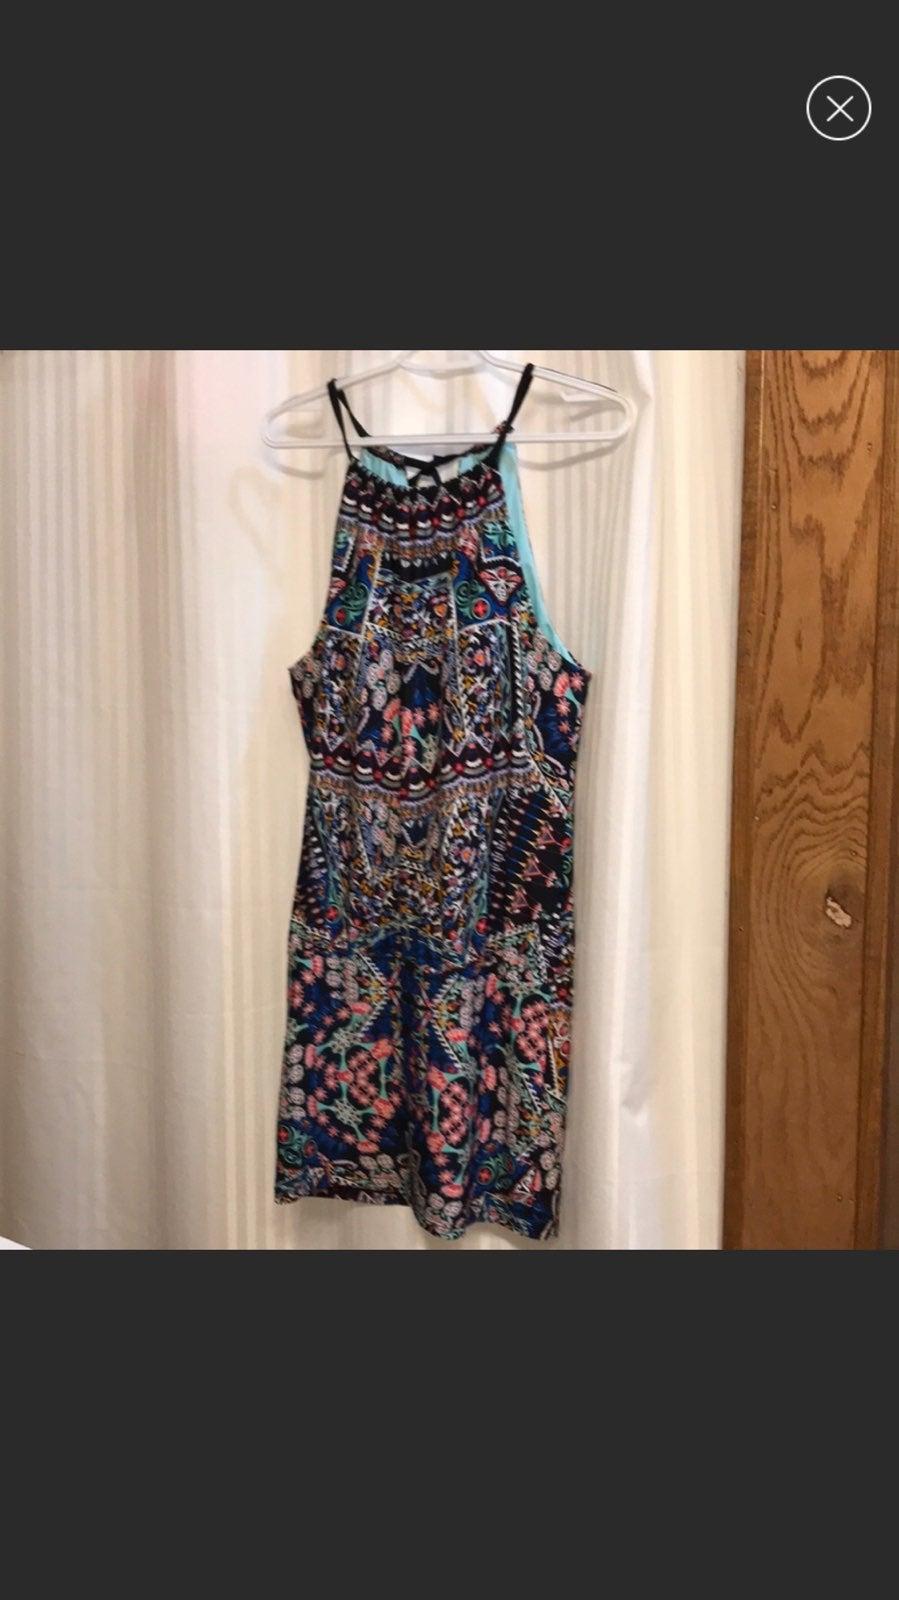 Swimsuit/dress cover-up. Medium, multico